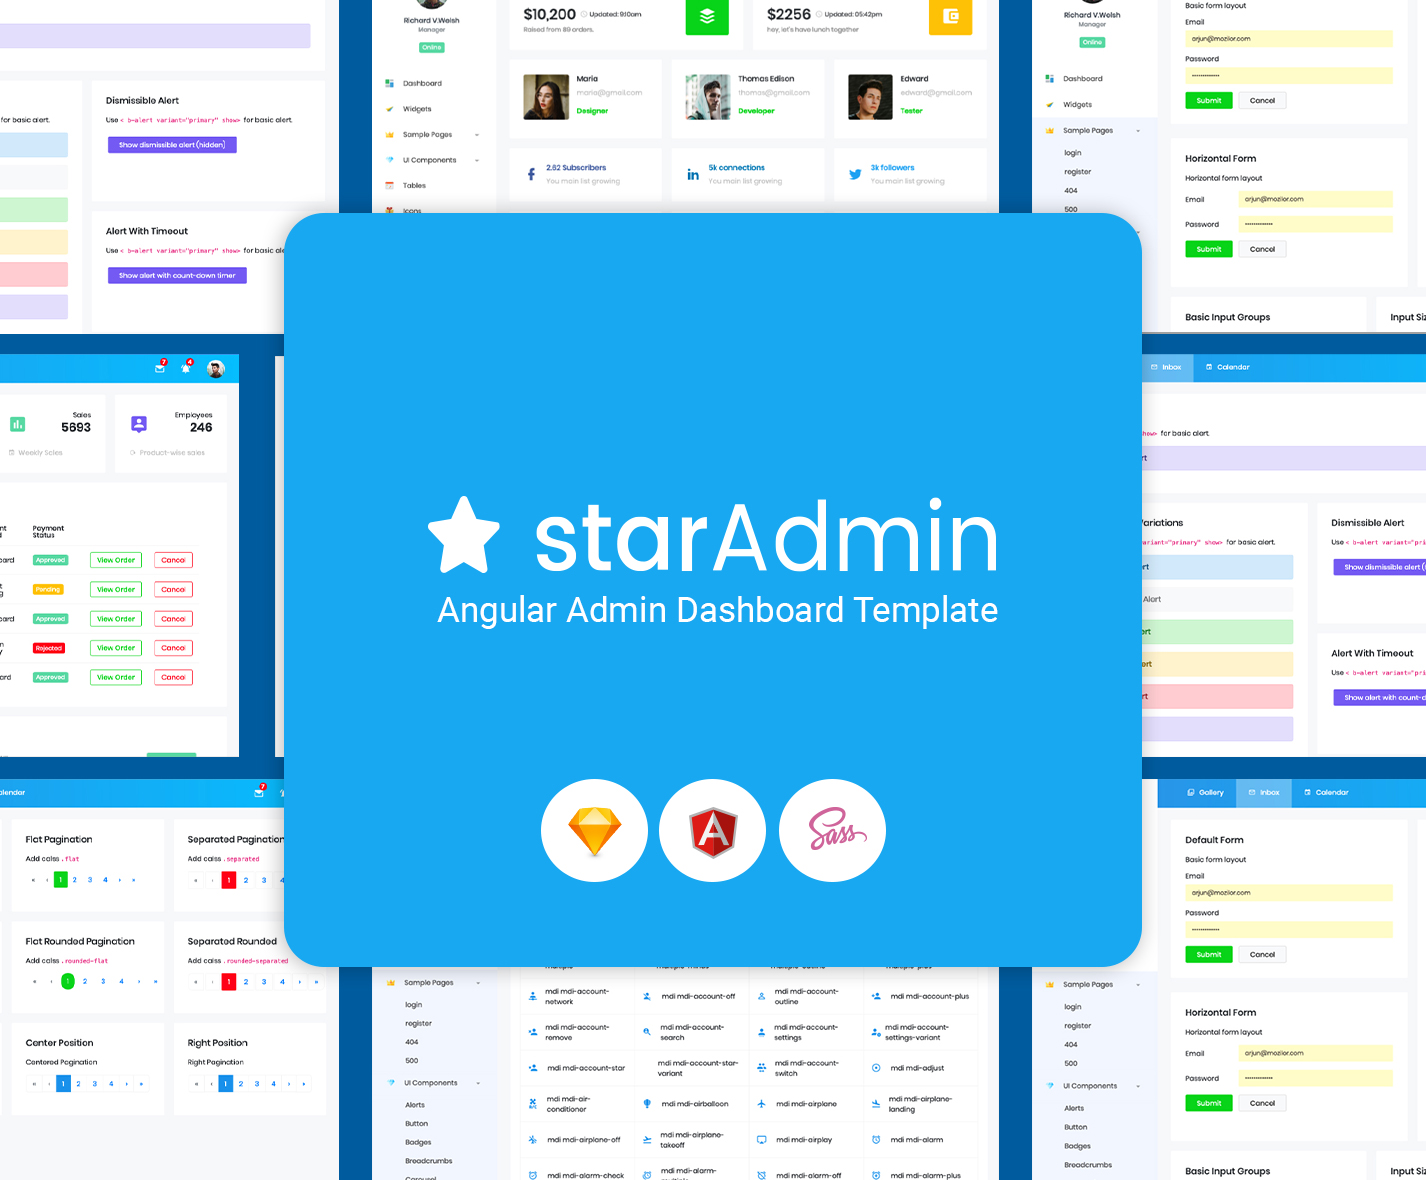 Star Admin Angular